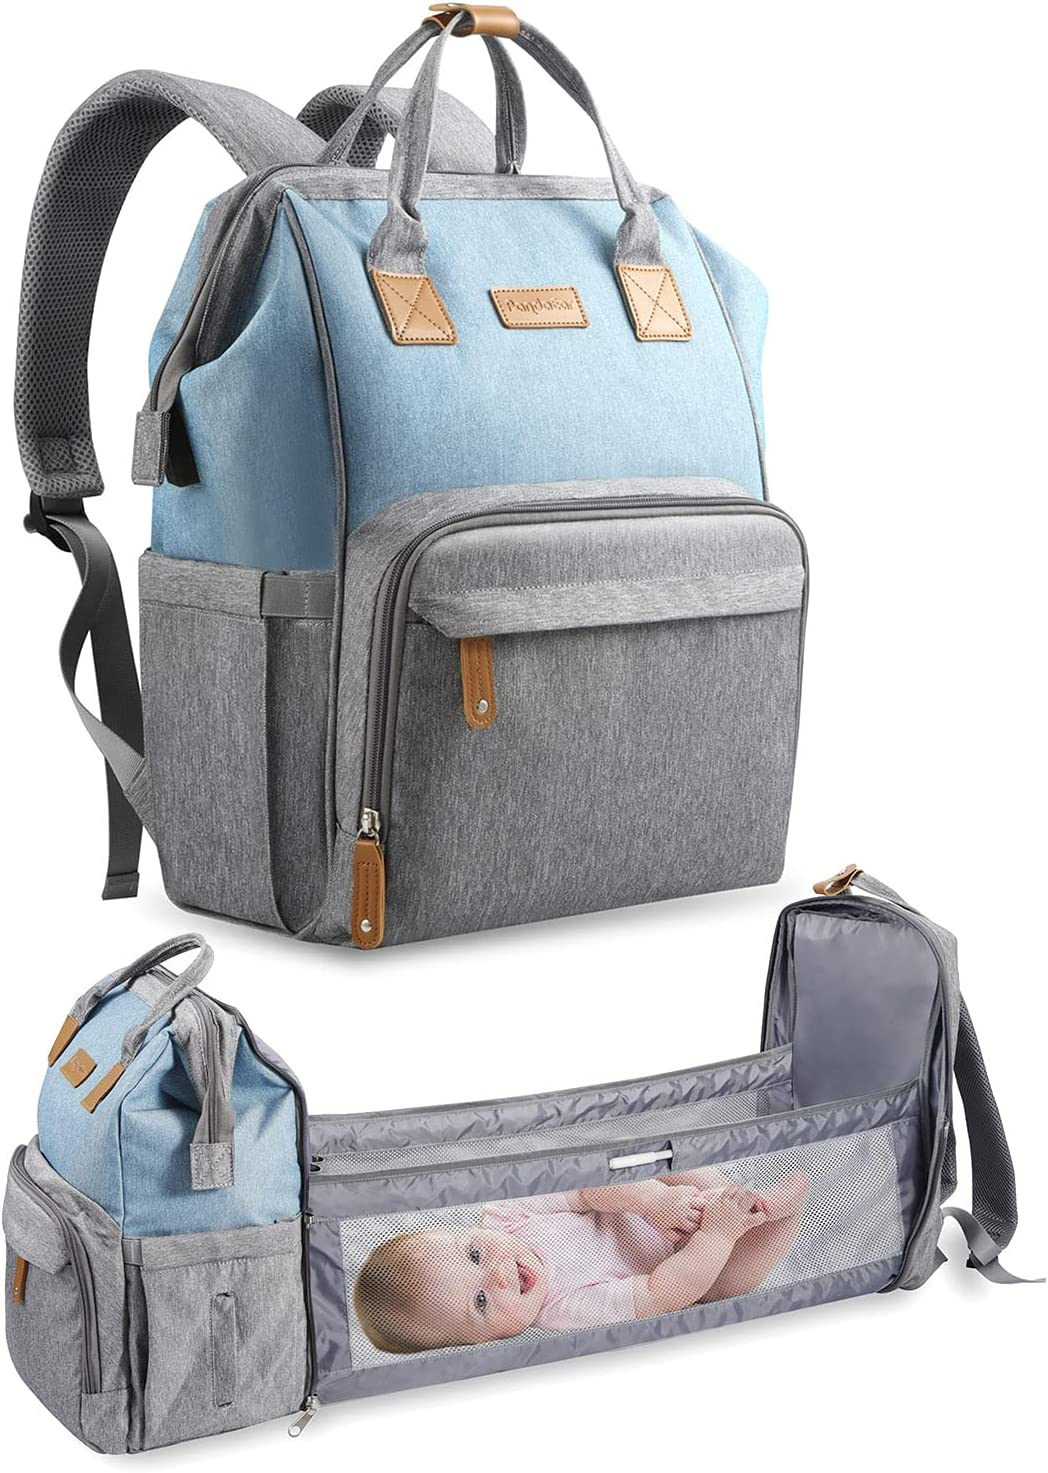 PandaEar Multi-Function Diaper Maternity Mommy Baby Travel Backpack Bag, Large Capacity (Blue)